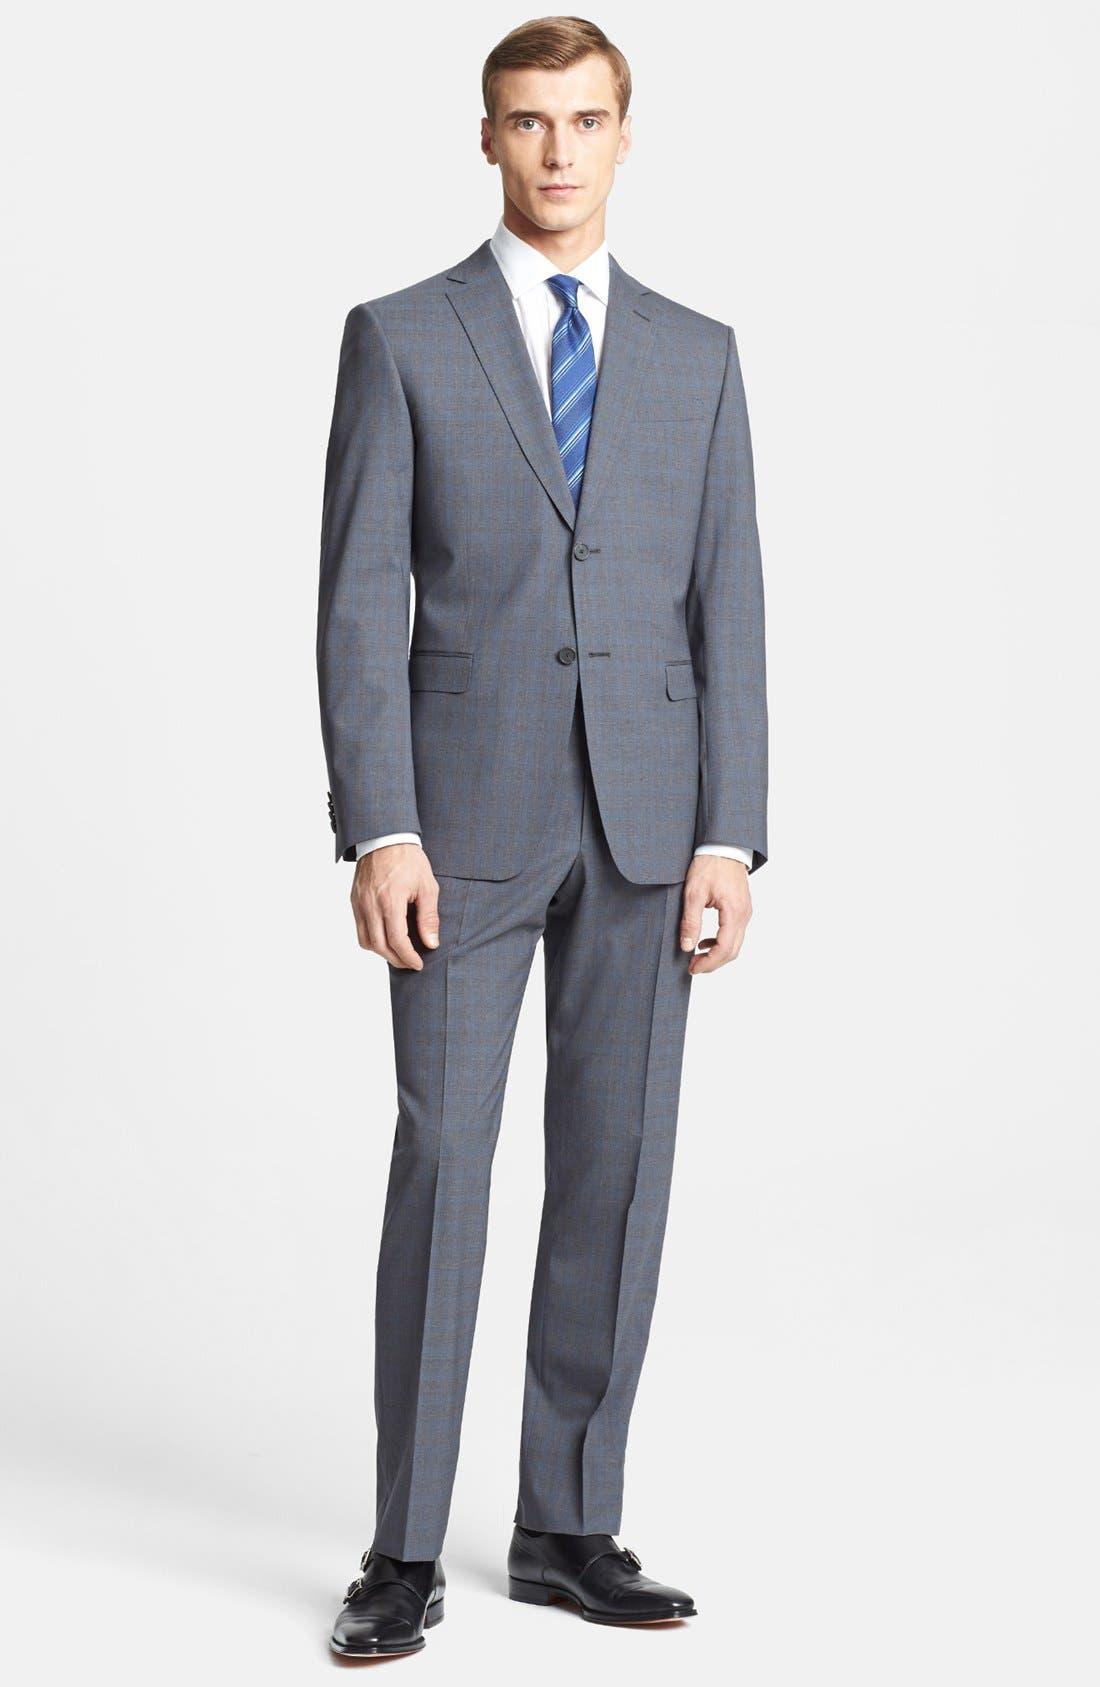 Alternate Image 1 Selected - Z Zegna Trim Fit Grey Wool Suit